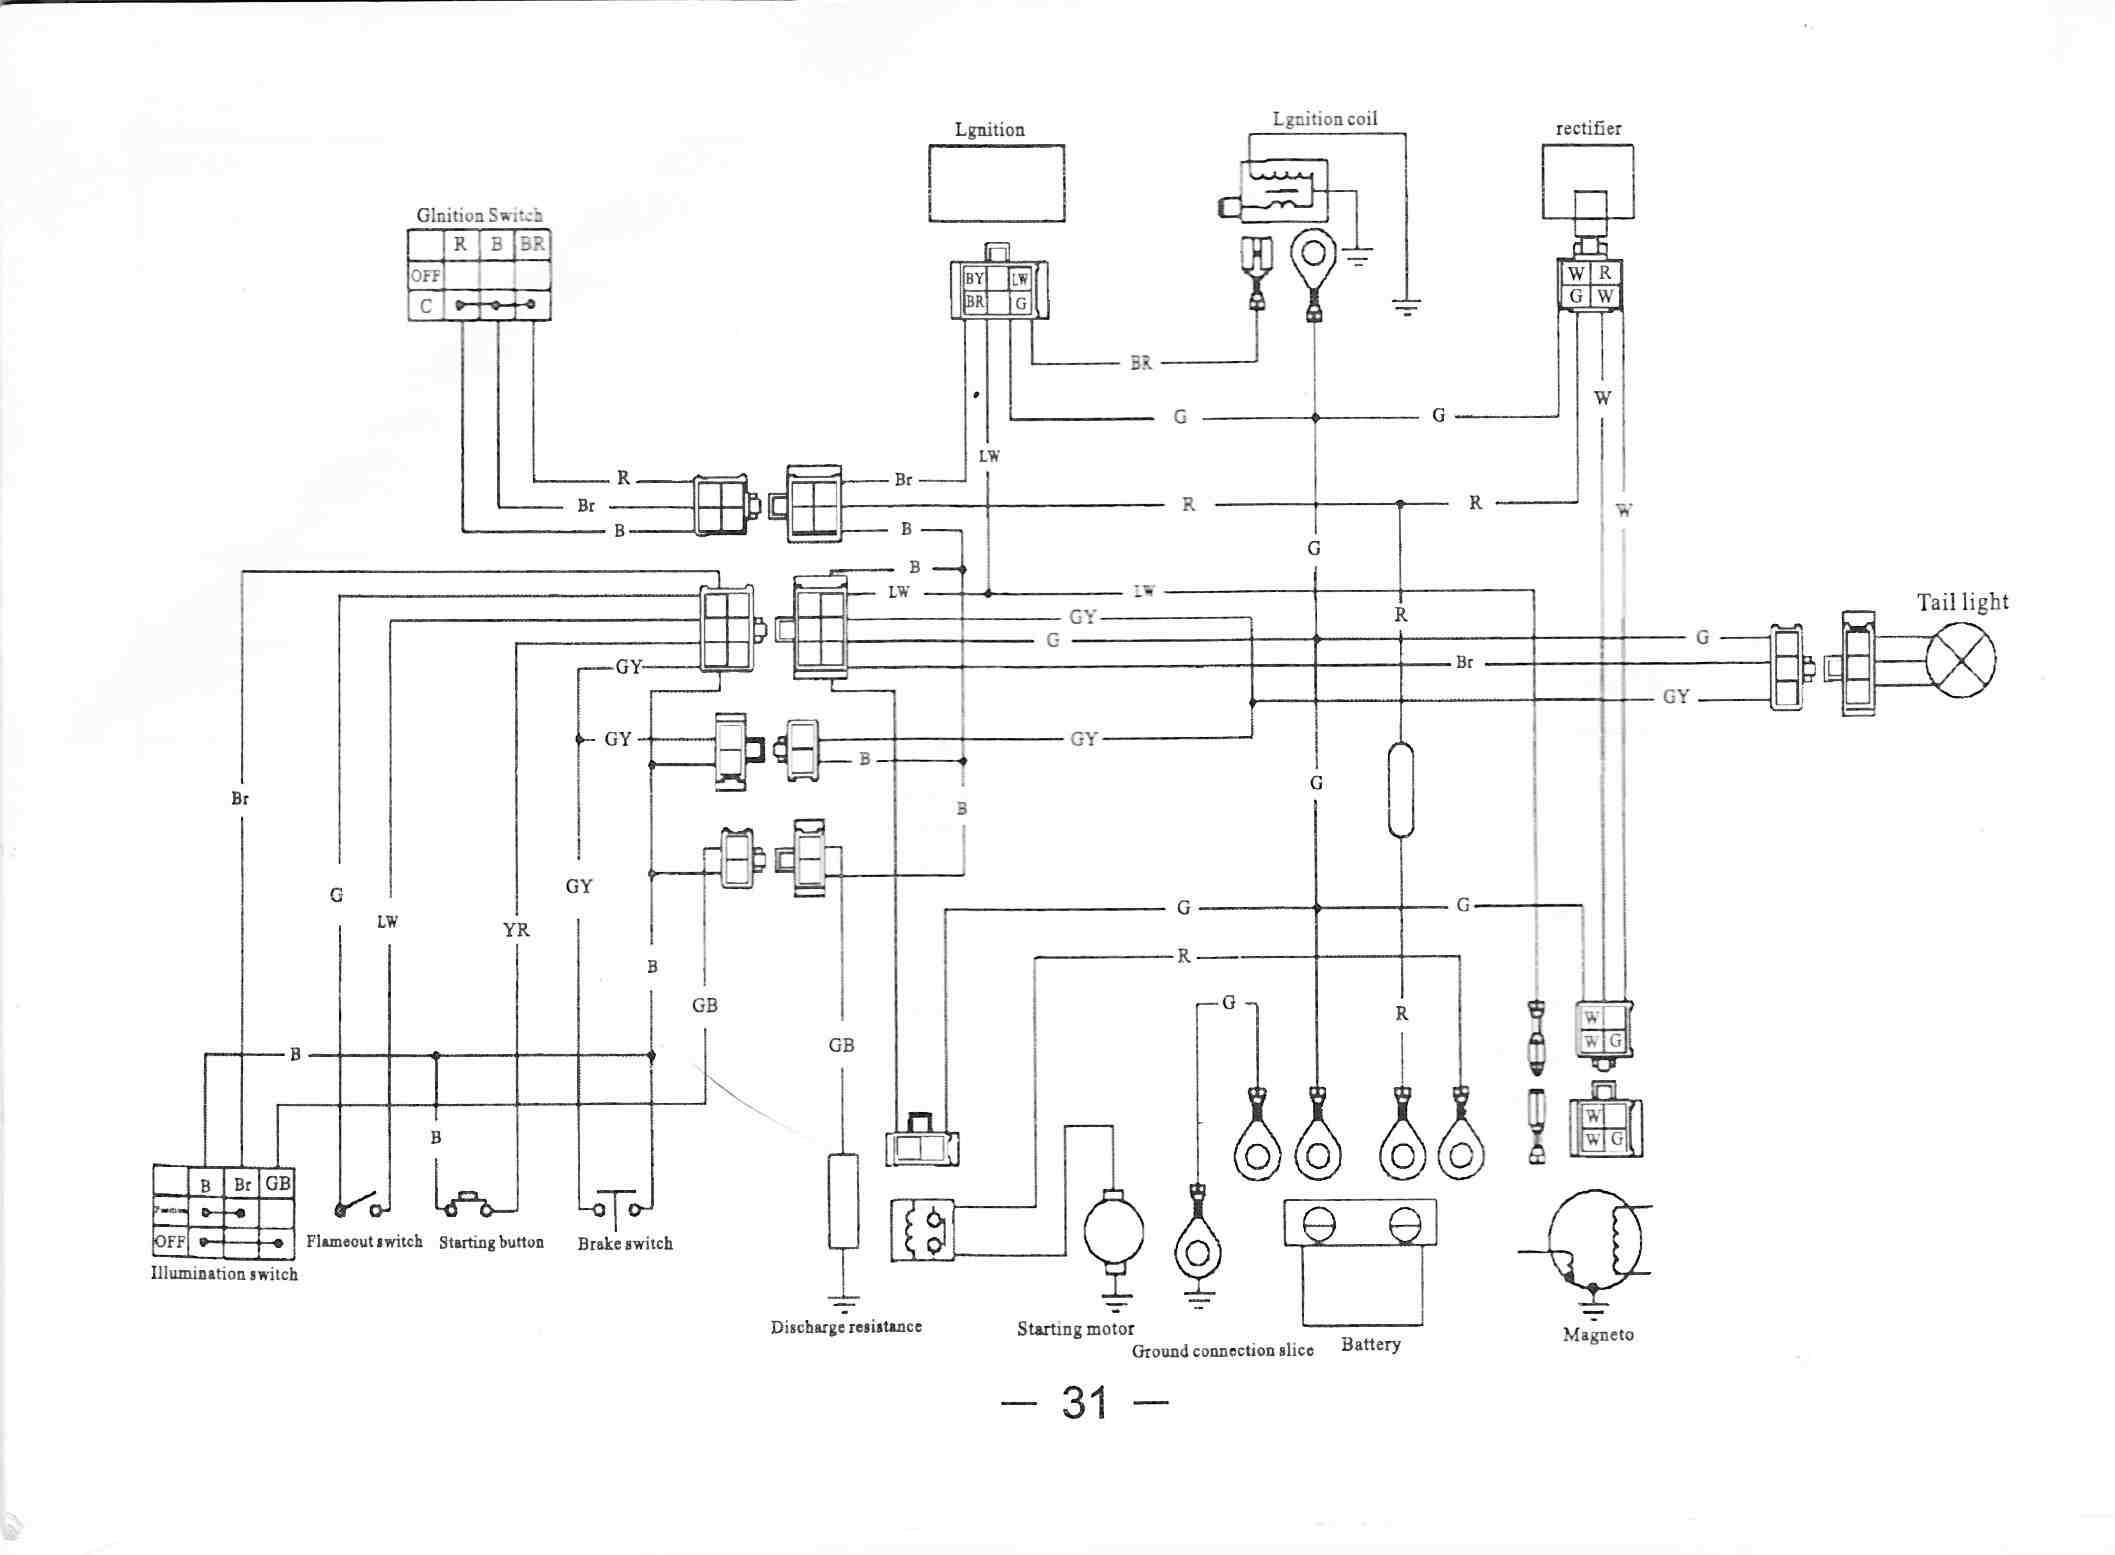 loncin 110cc engine wiring tao tao 110cc engine wiring wiring Lofom 110Cc Engine kazuma 4 wheeler wire diagram wiring diagrams schema 5 pin cdi wiring diagram 110cc atv loncin 4 wheeler wiring diagram